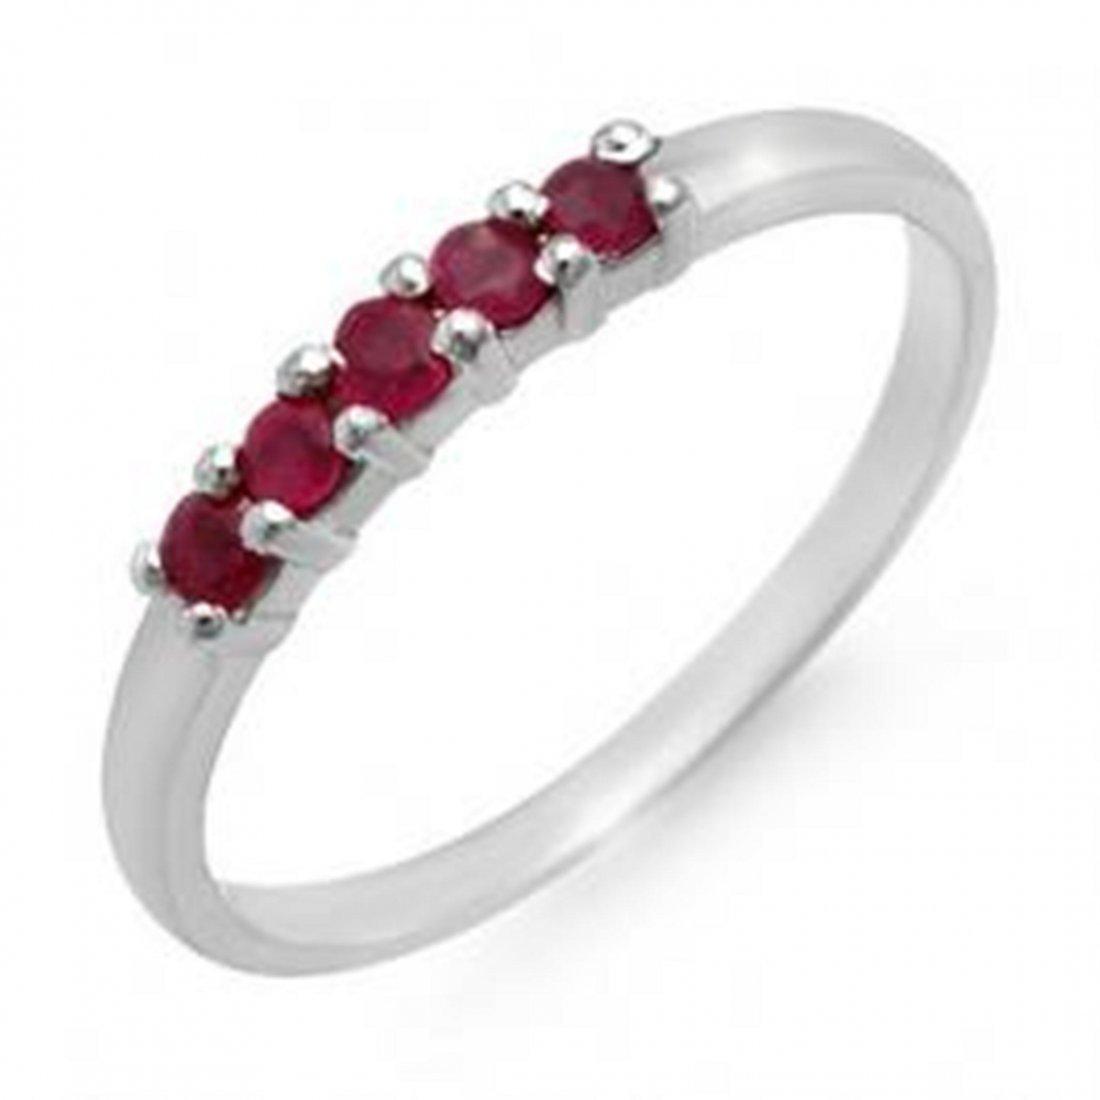 0.25 ctw Ruby Ladies Ring 10K